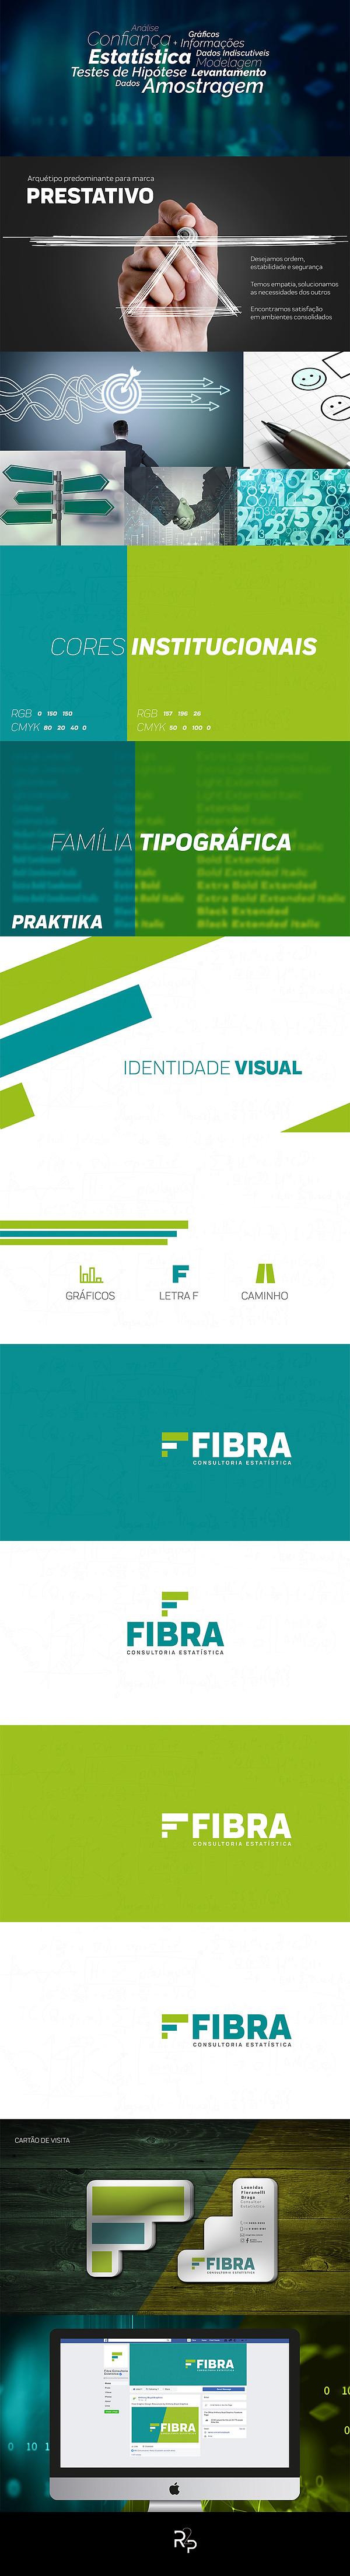 PARAPOST-FIBRA.jpg